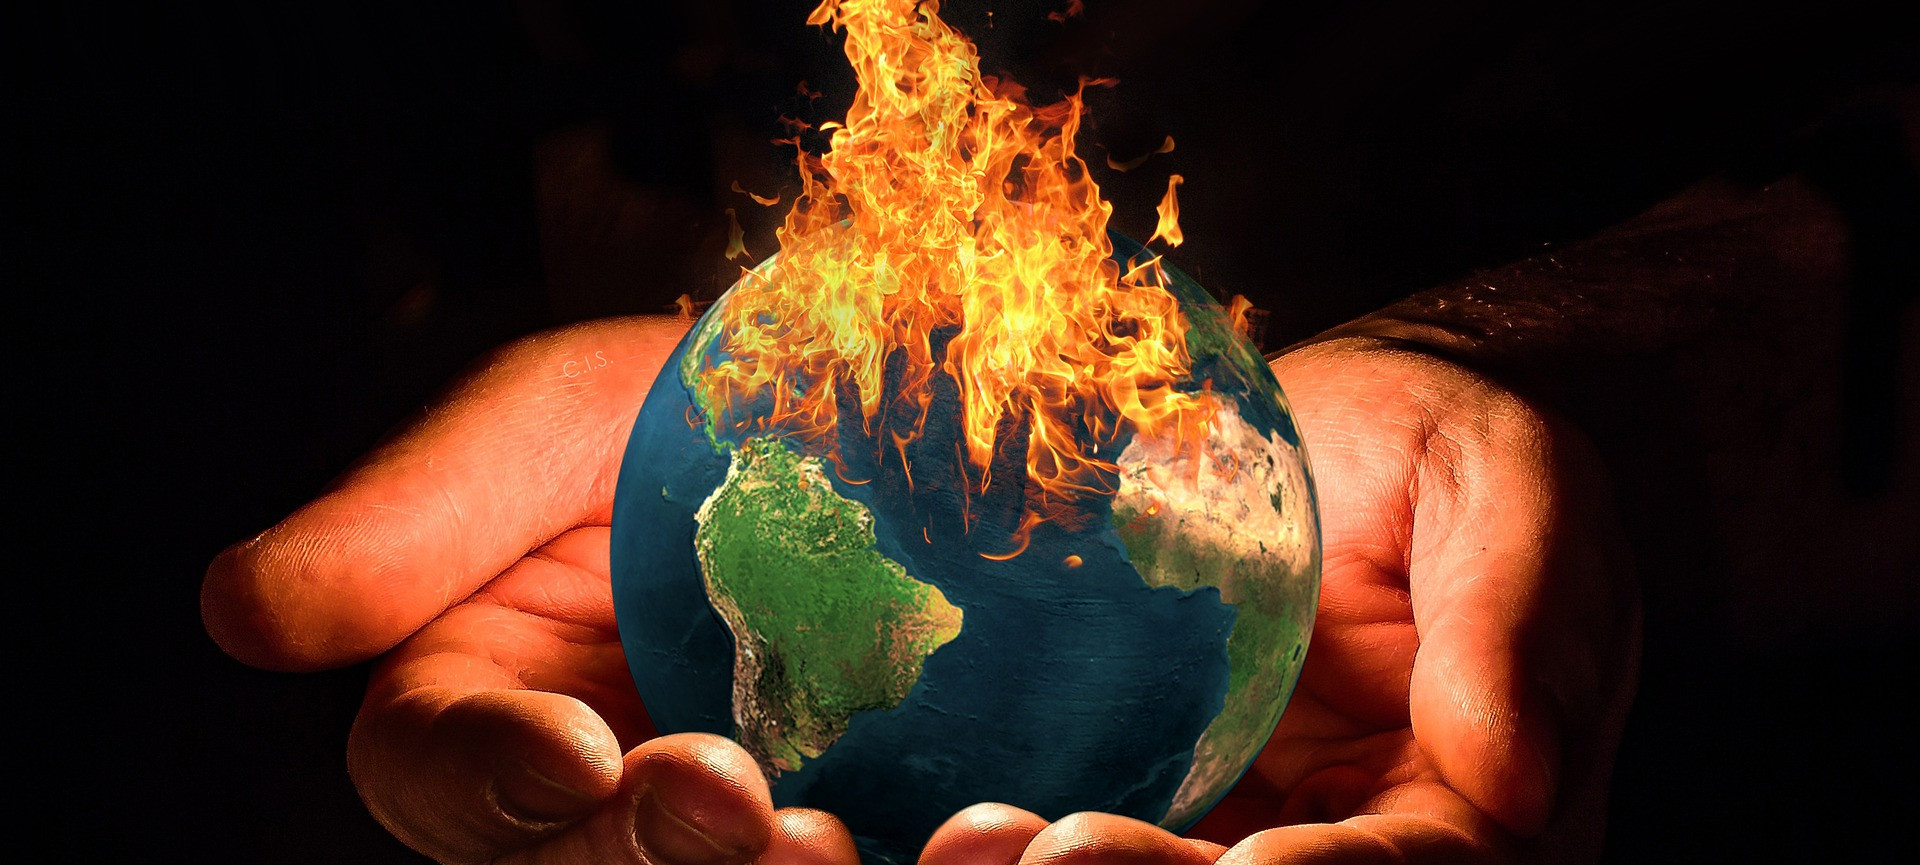 Planet_fire(2).jpg